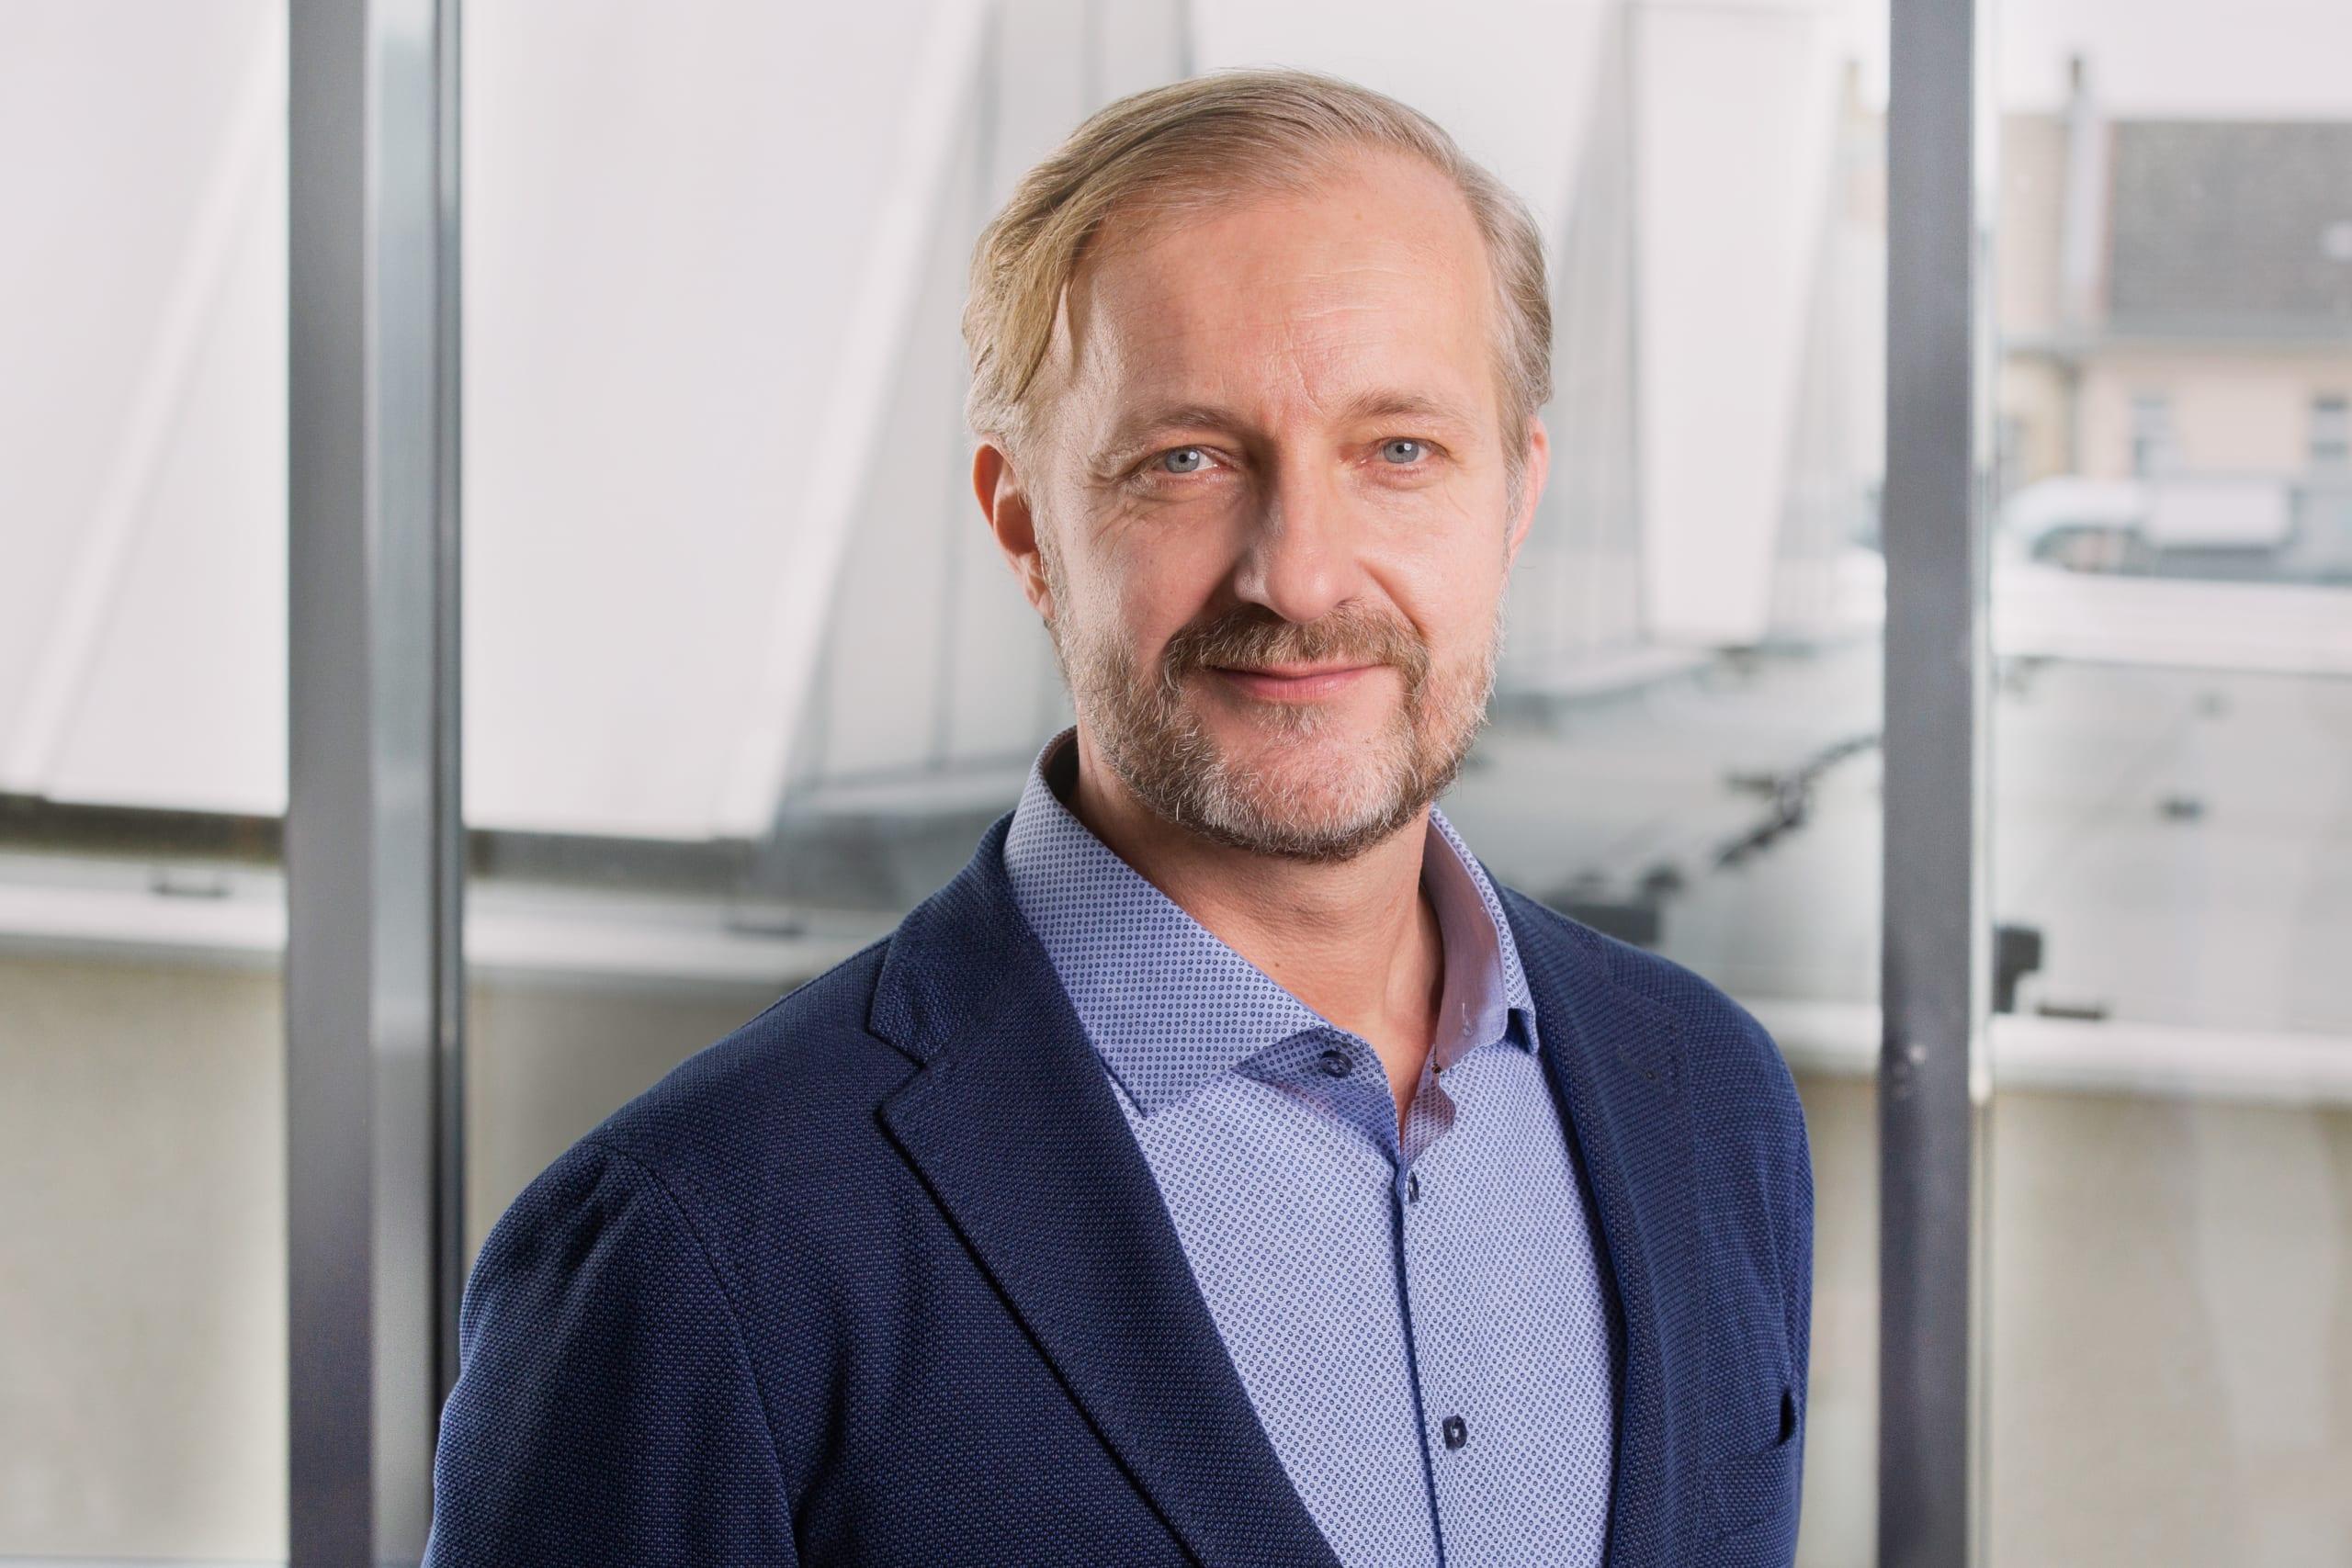 Meet Dennis Dörfl the New Director of Spreadshop